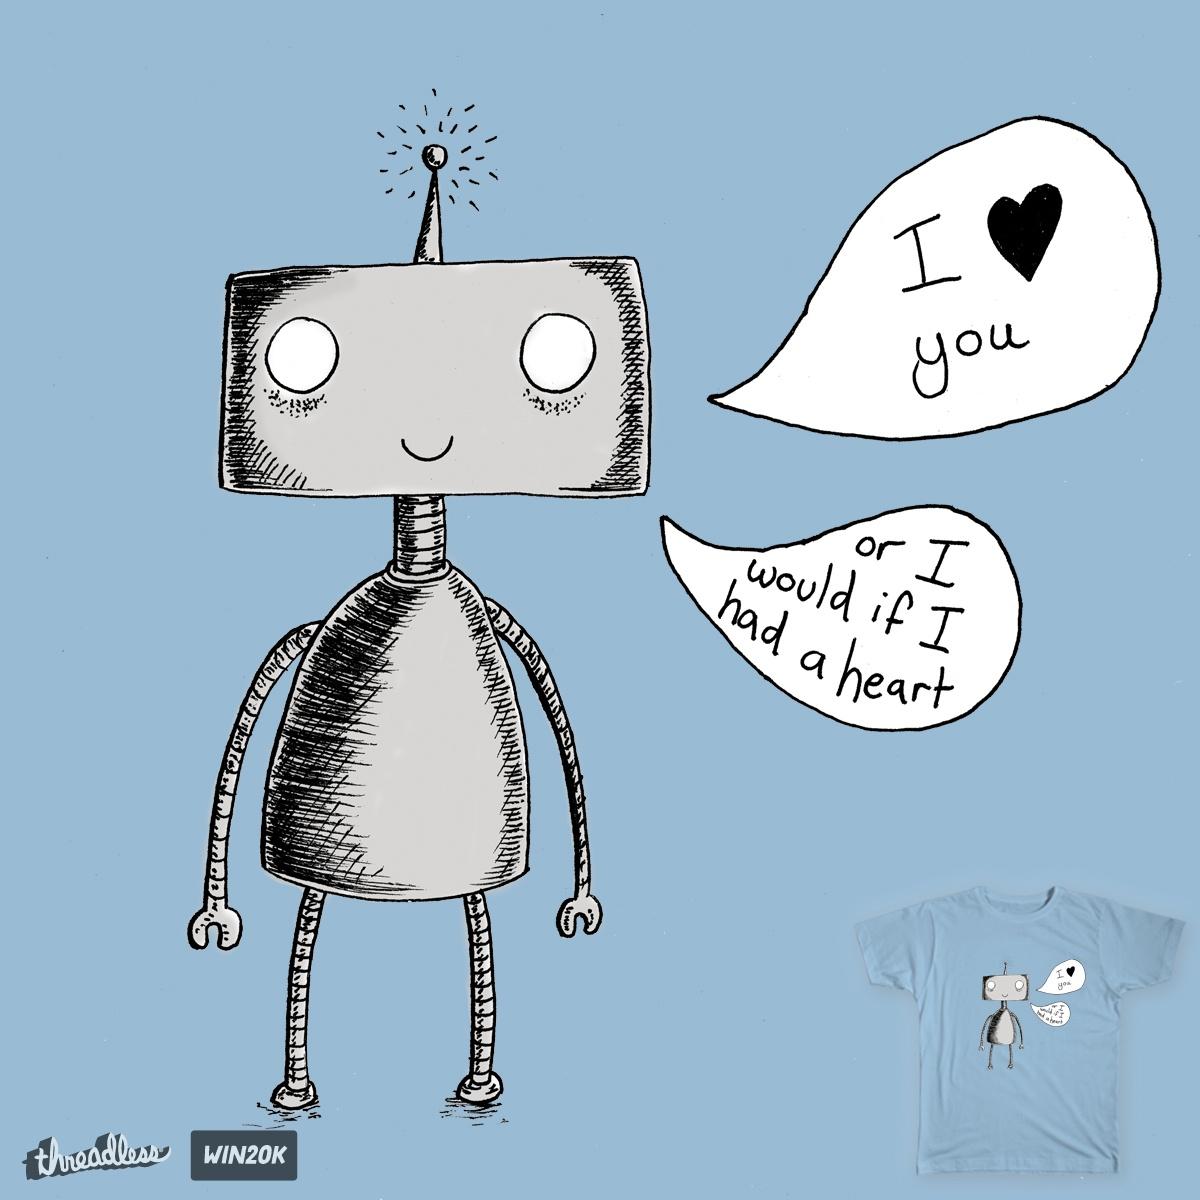 Love Machine by BaronVonMonkey on Threadless